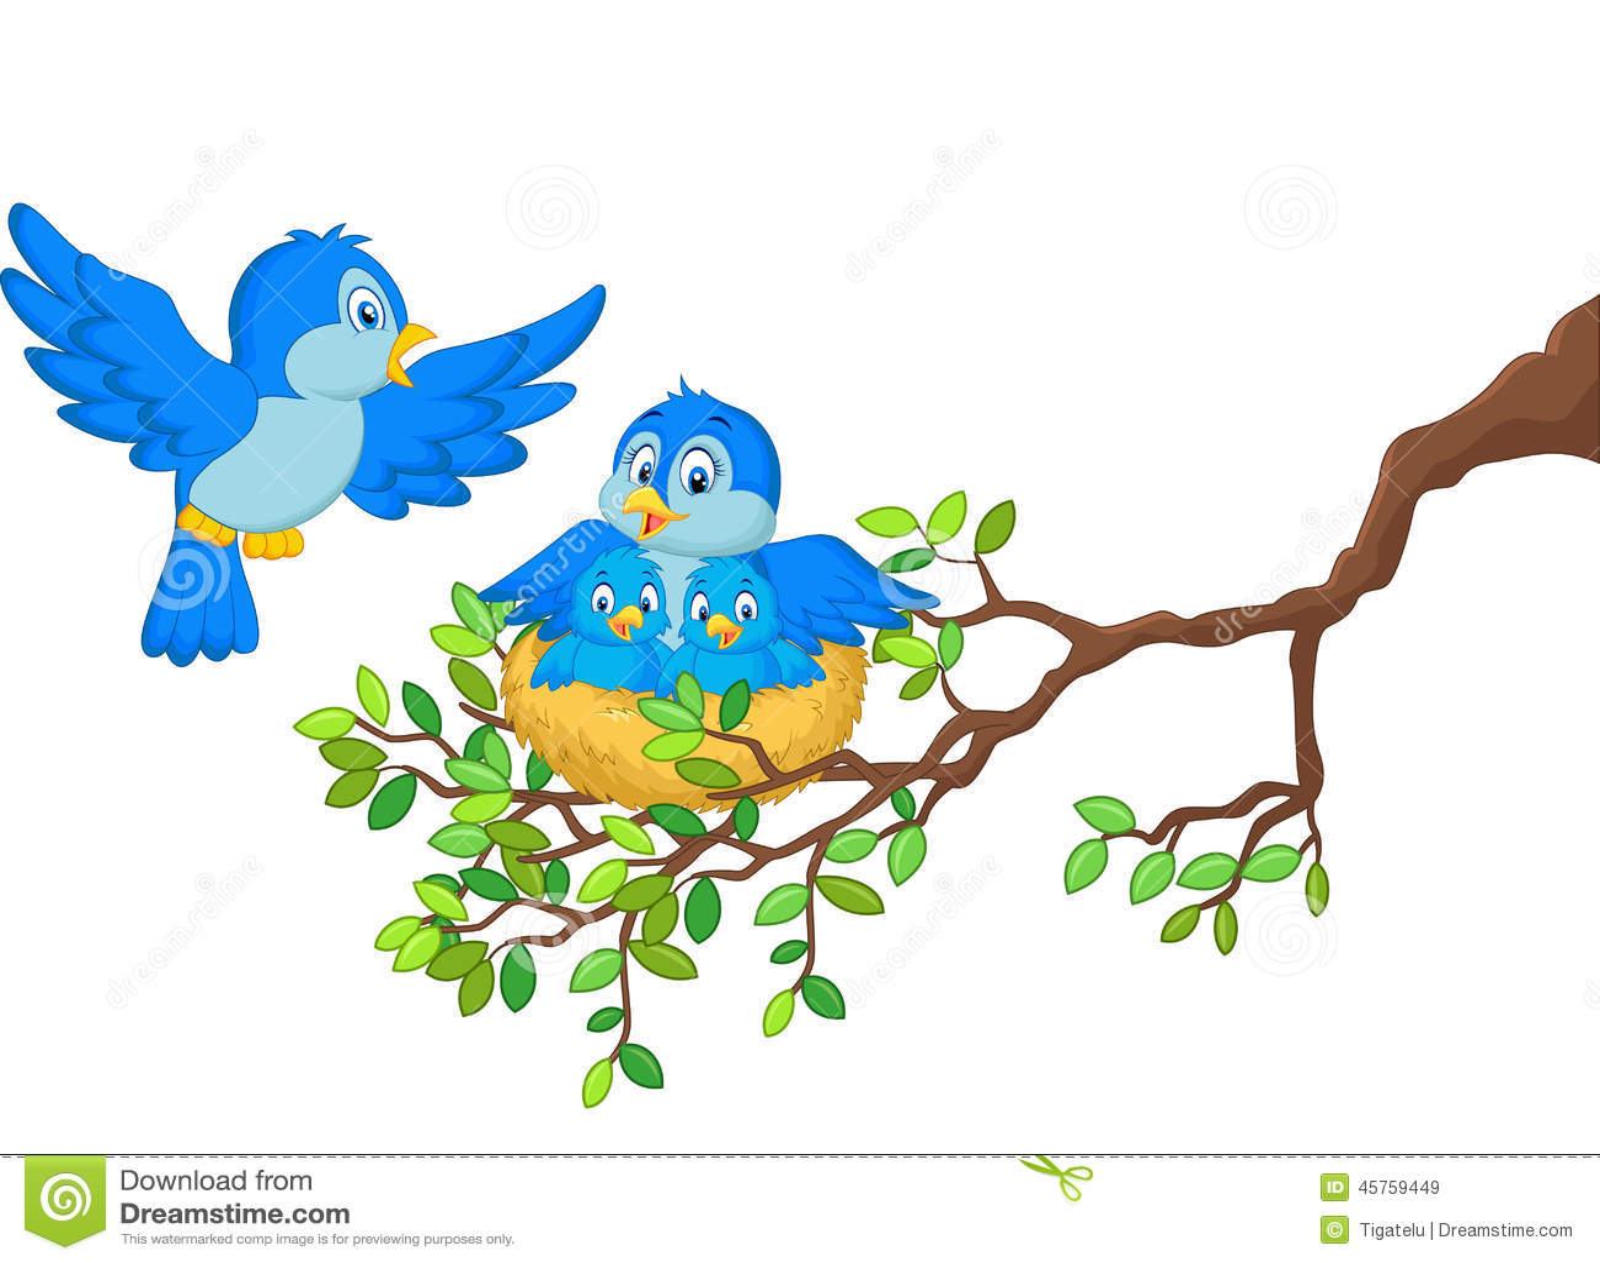 cartoon birds her two babies nest illustration 45759449